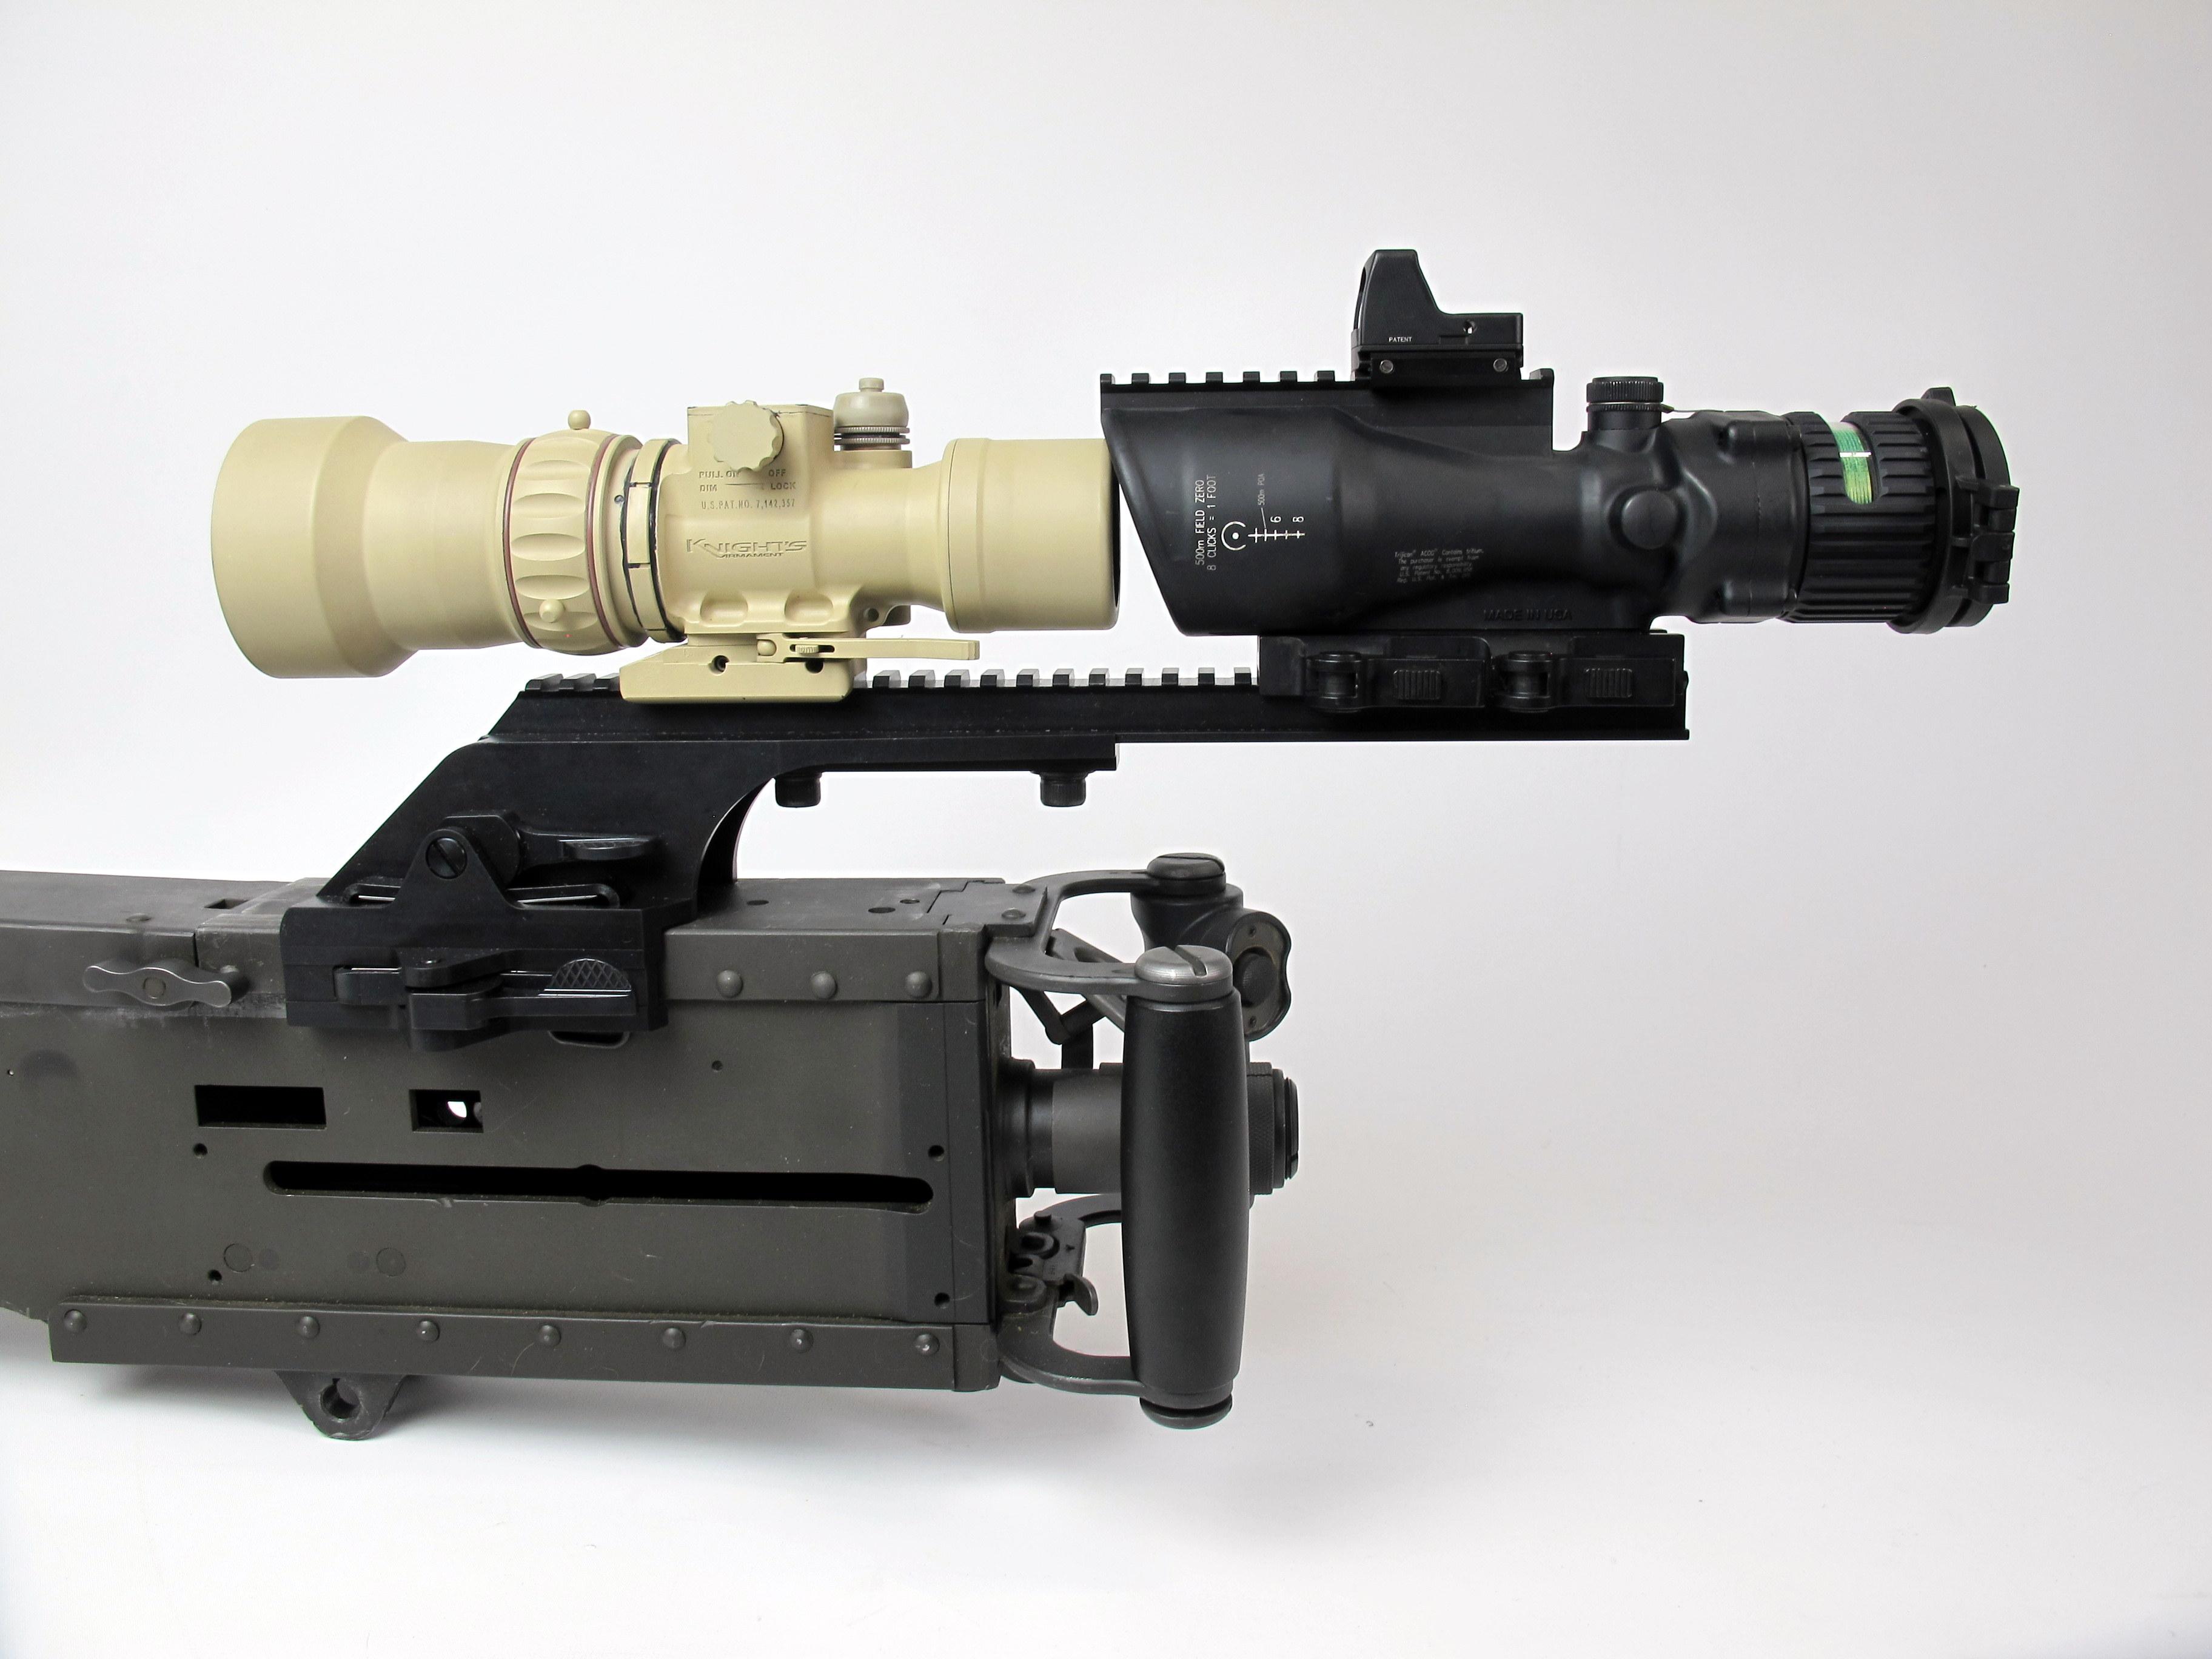 50 BMG Mount